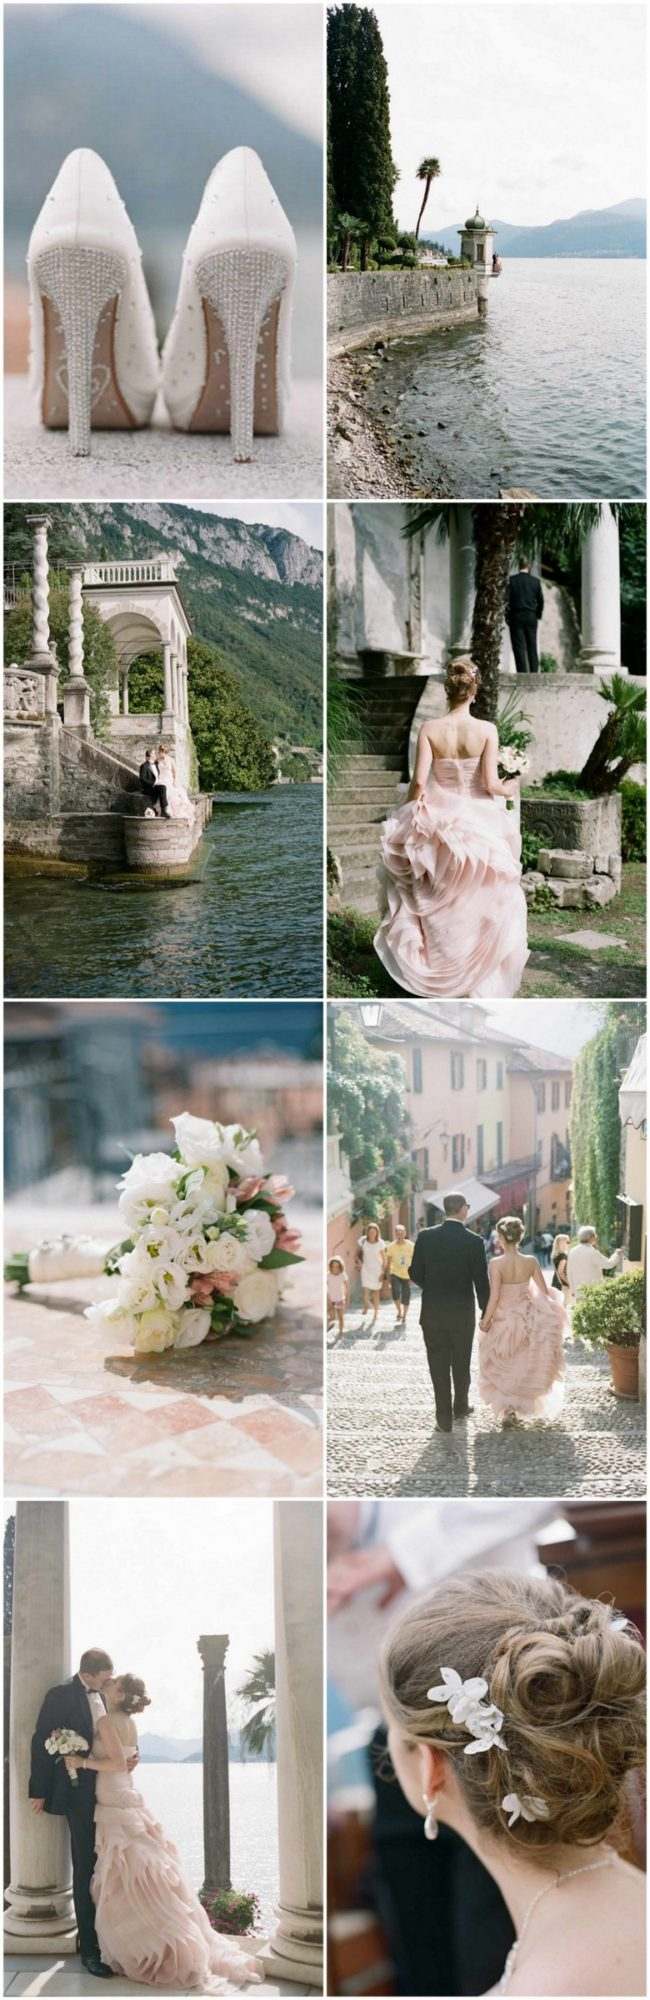 Elegant Lake Como Elopement in Italy